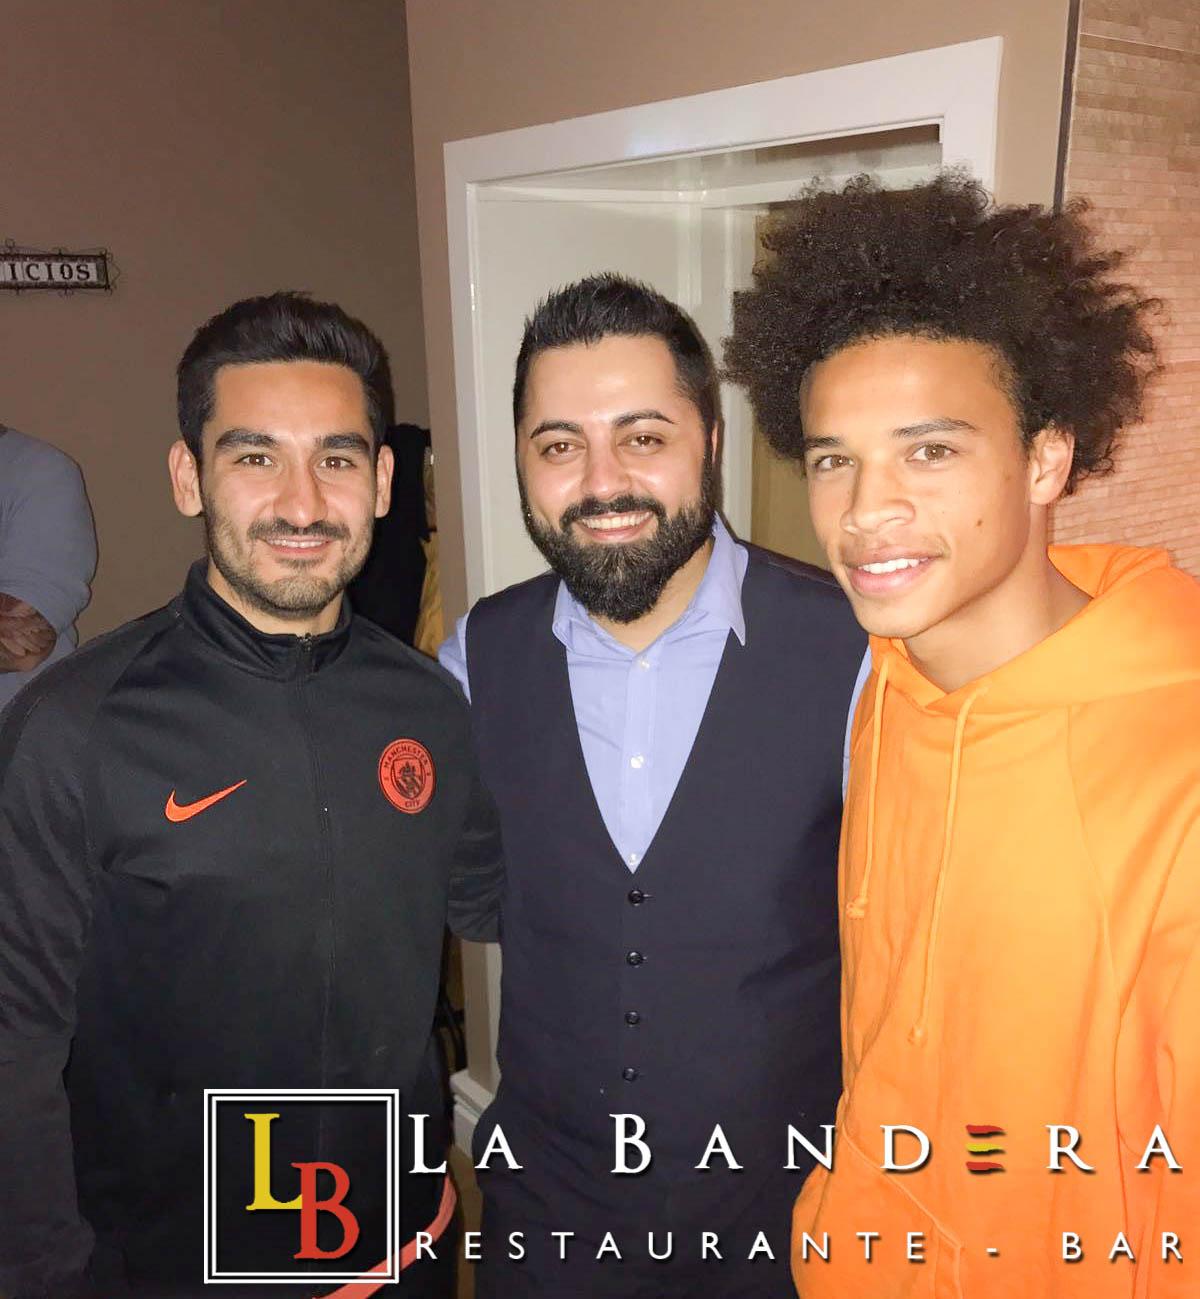 Ilkay Gundogan and Leroy Sane at La Bandera